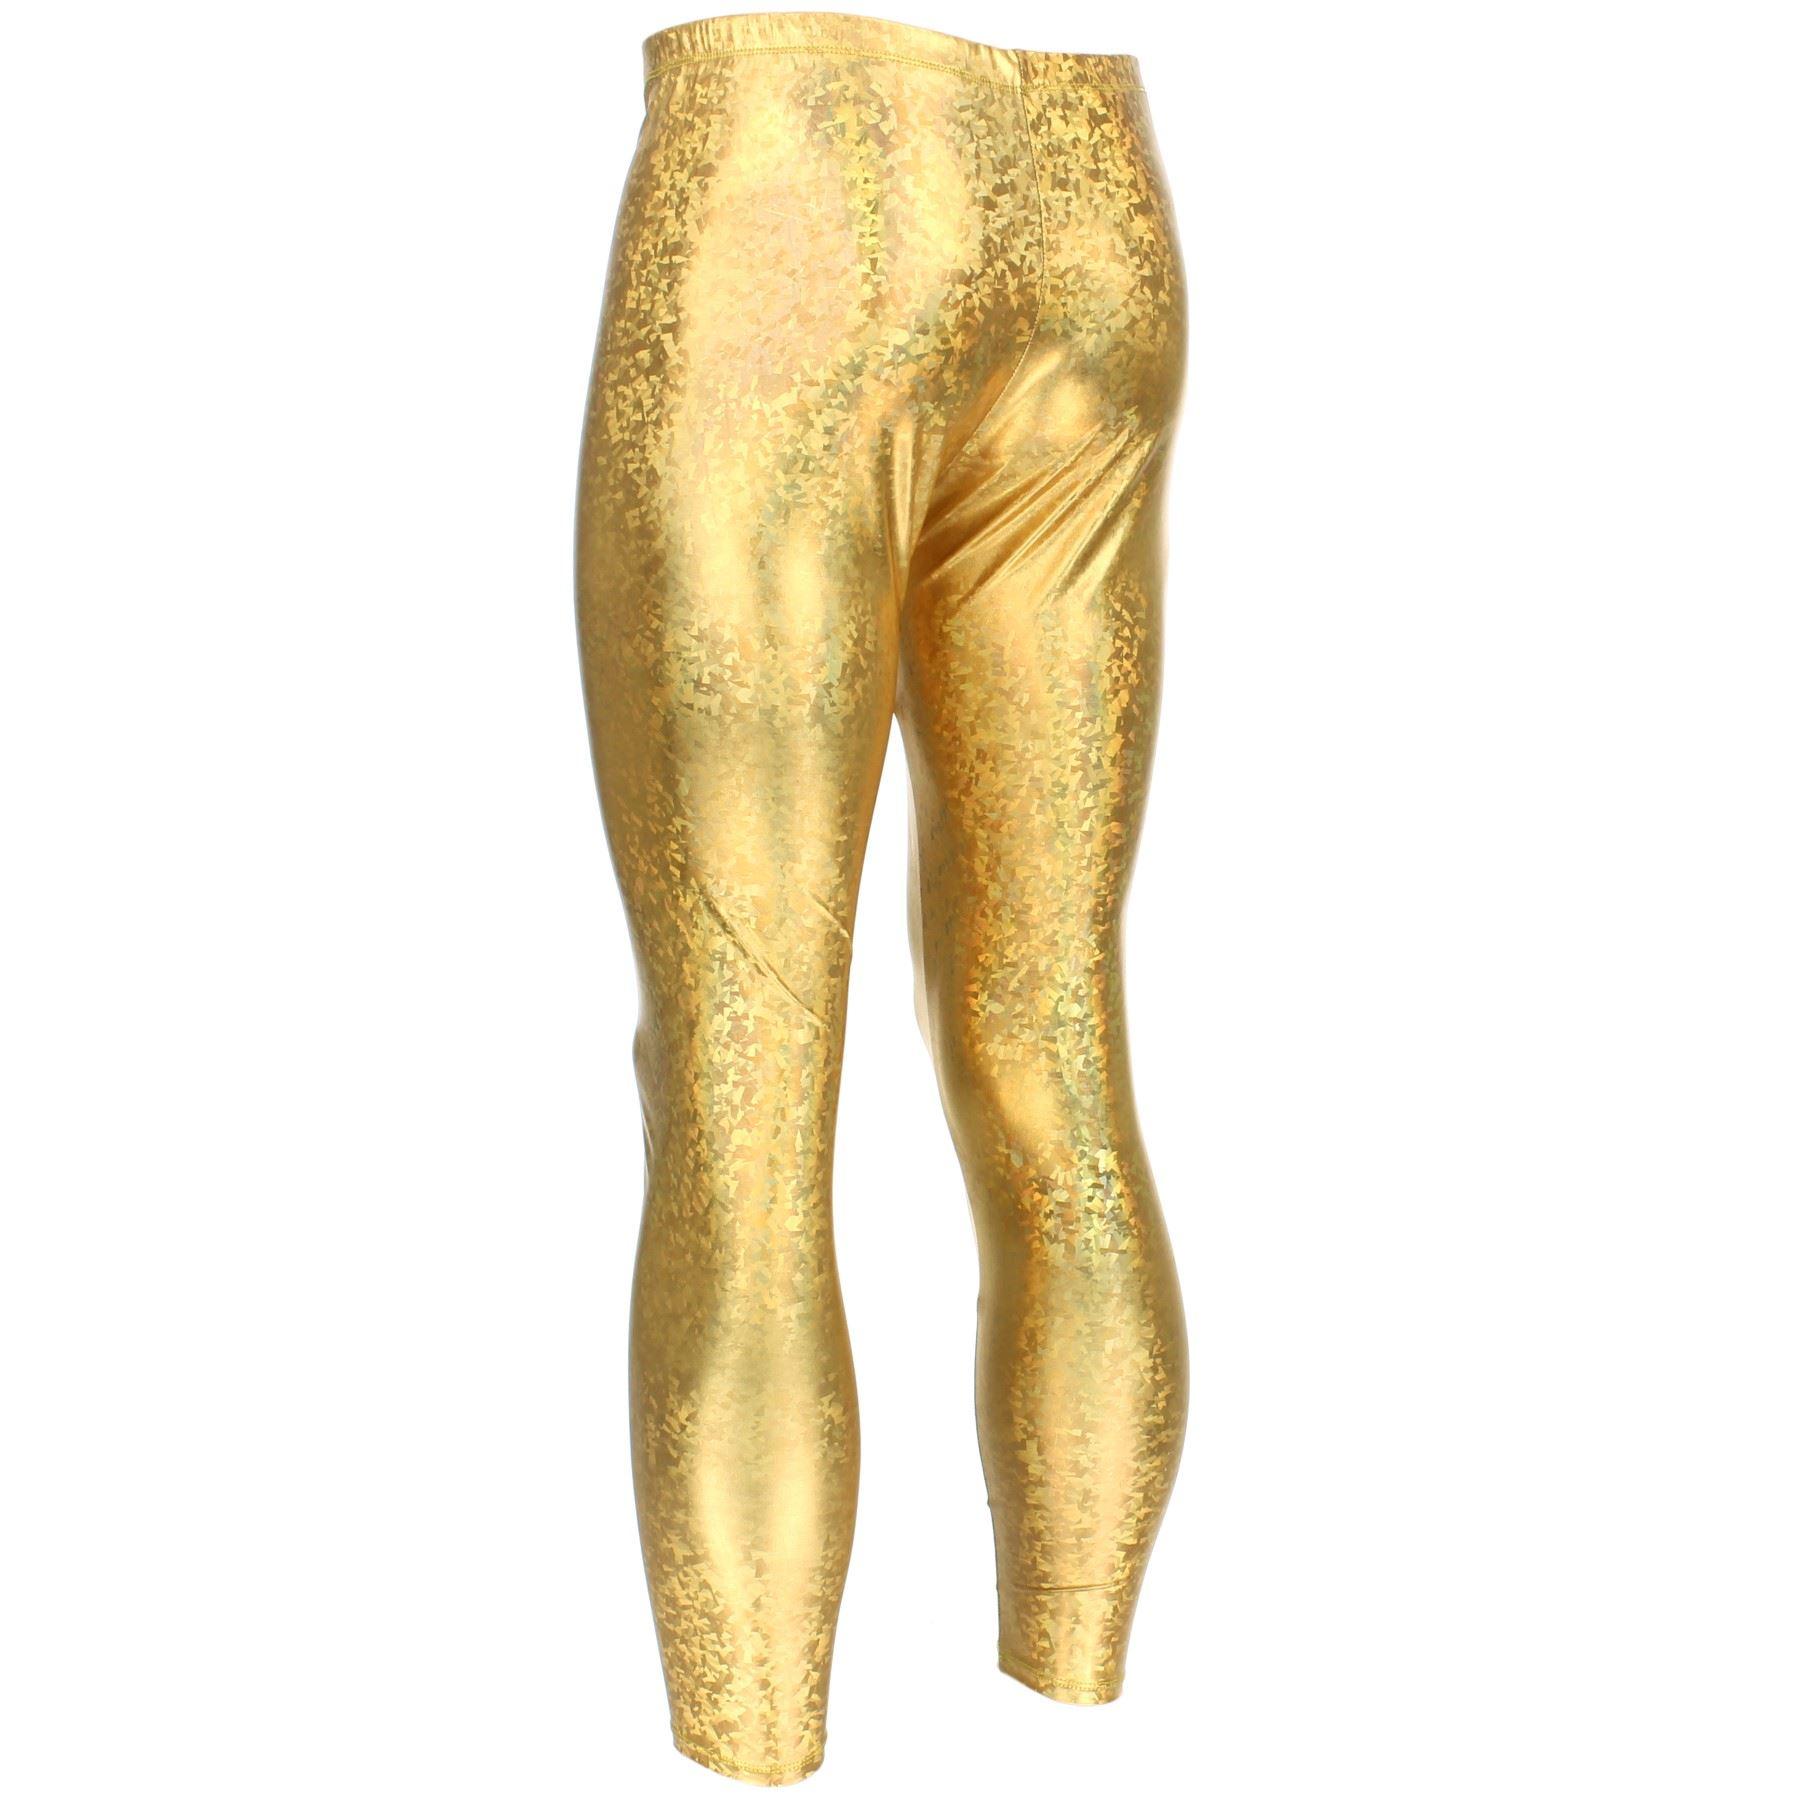 Party argento Mens Festival Sirene Scintillanti Meggings Oro Scintillanti Leggings arcobaleno TnxqnFX4